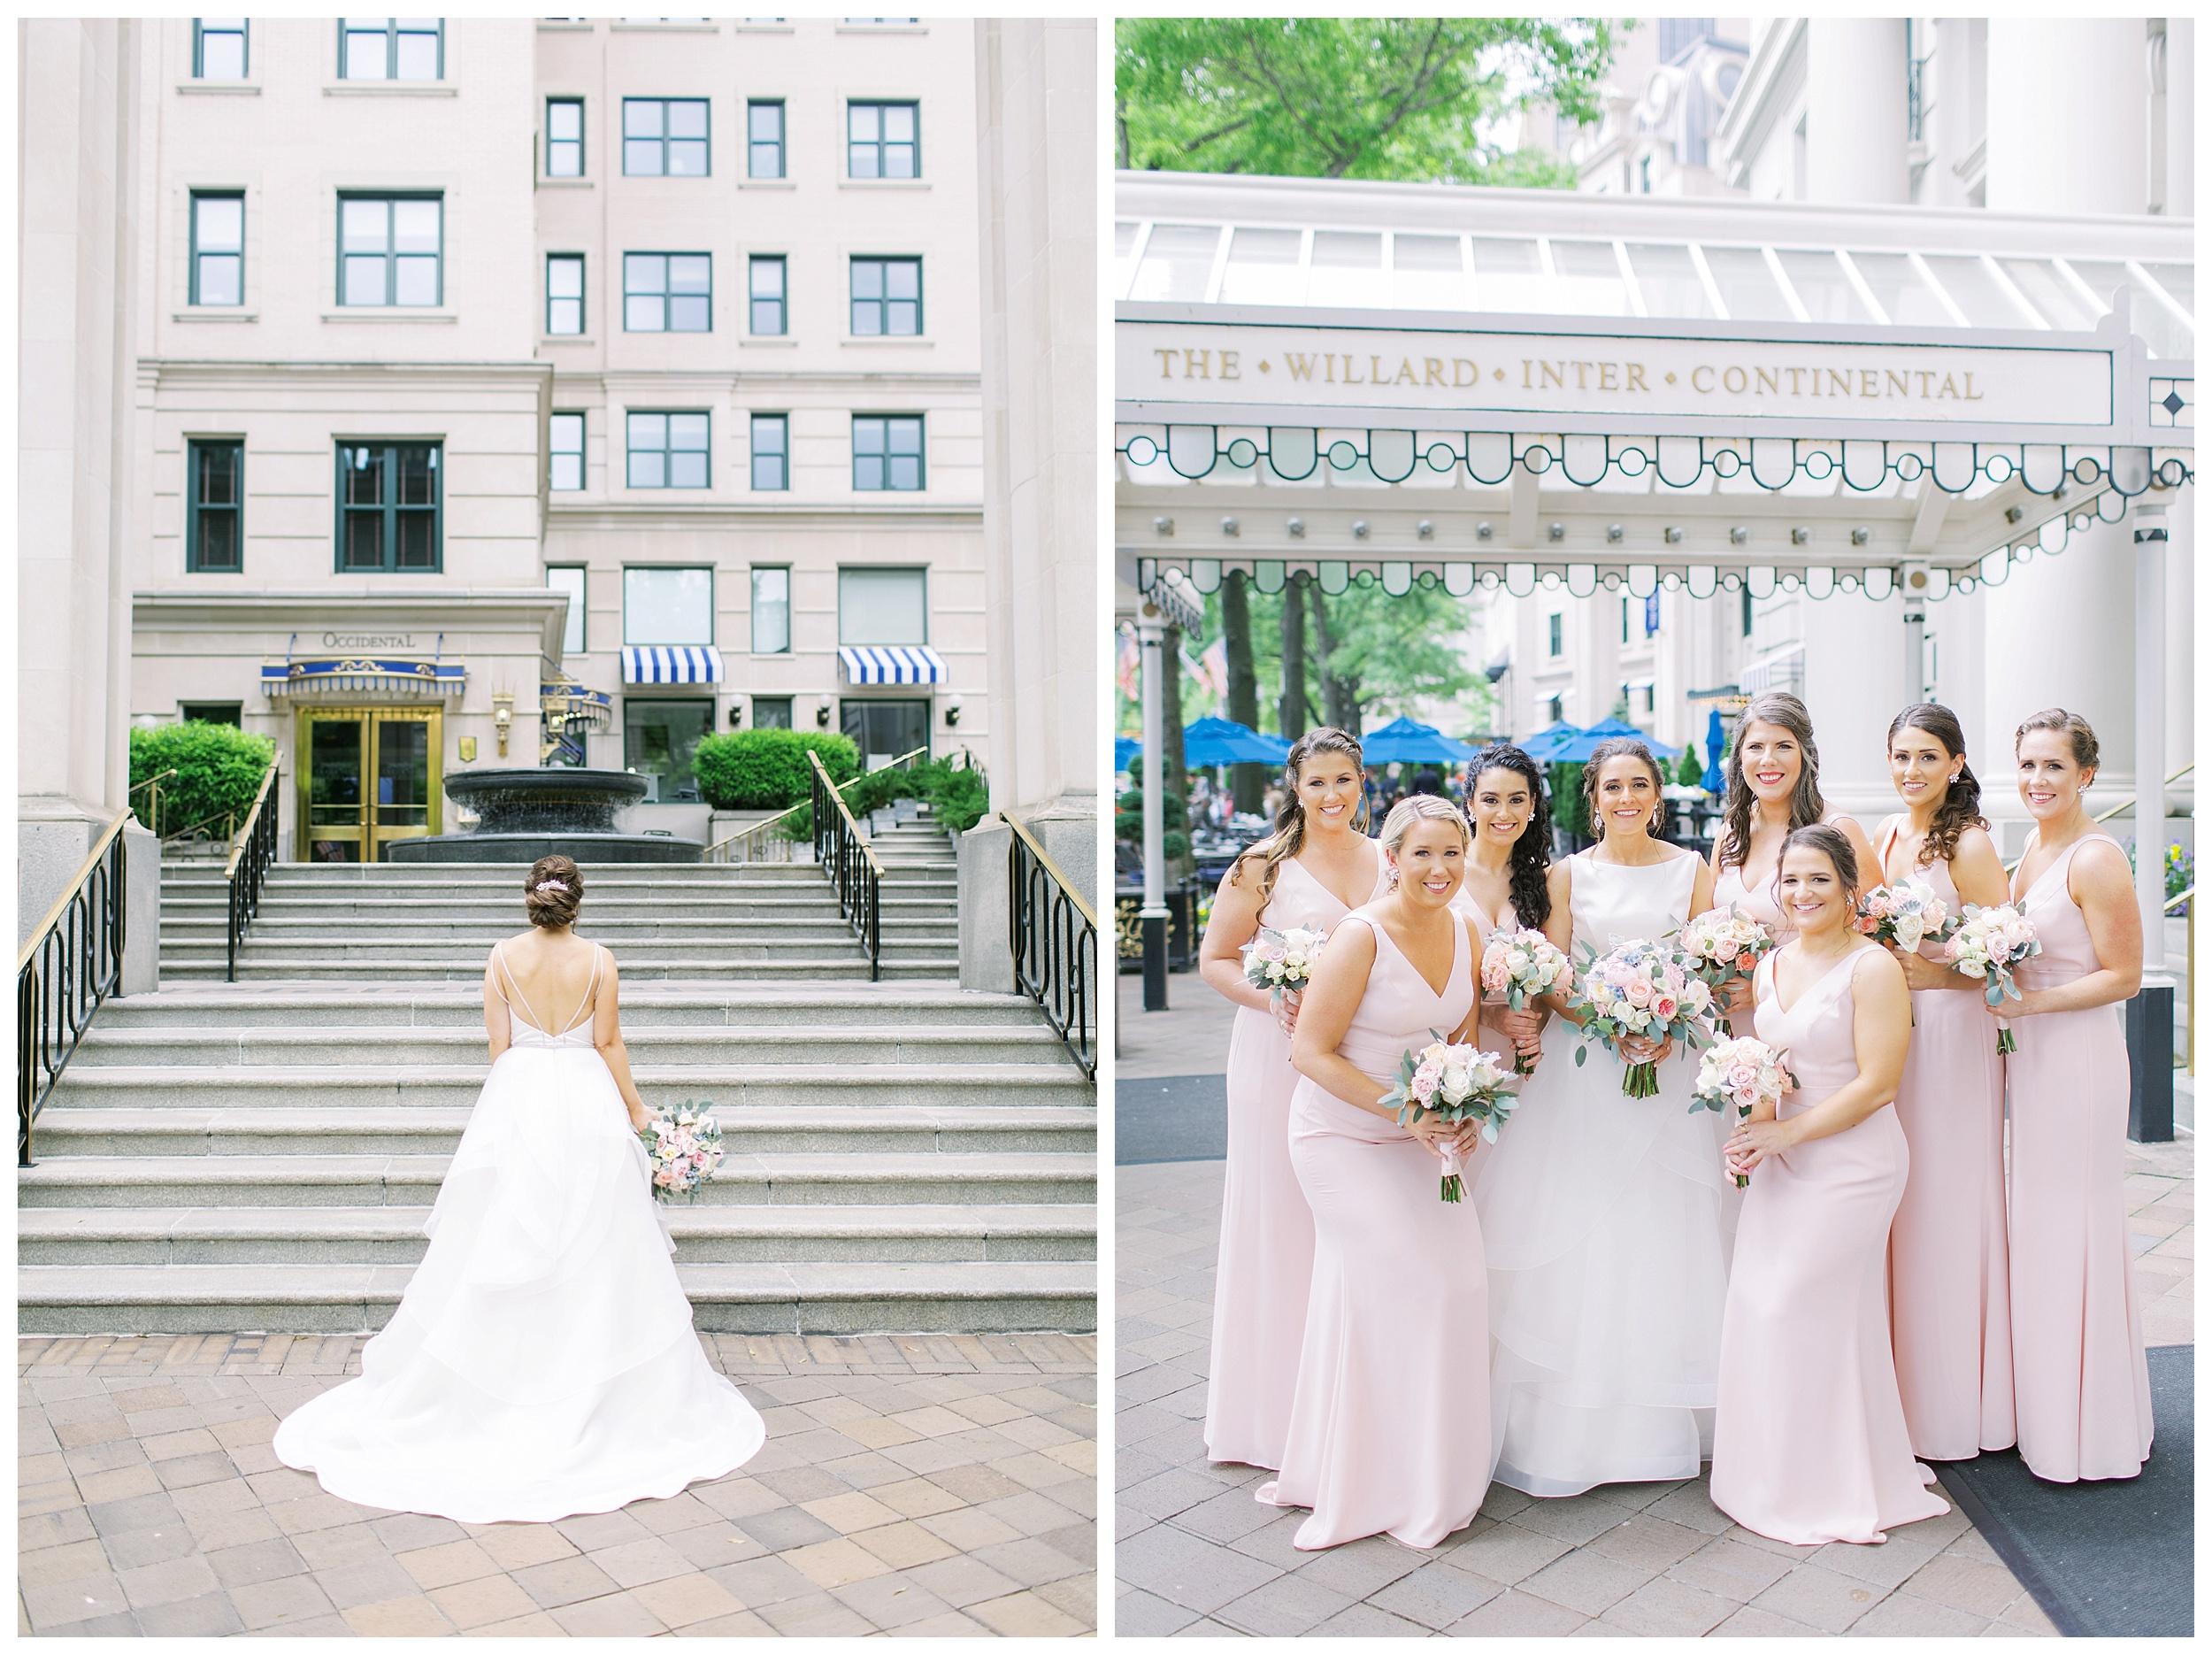 DAR Constitution Hall Wedding Wedding | Daughters of the American Revolution Wedding | District of Columbia Film Wedding Photographer Kir Tuben_0038.jpg